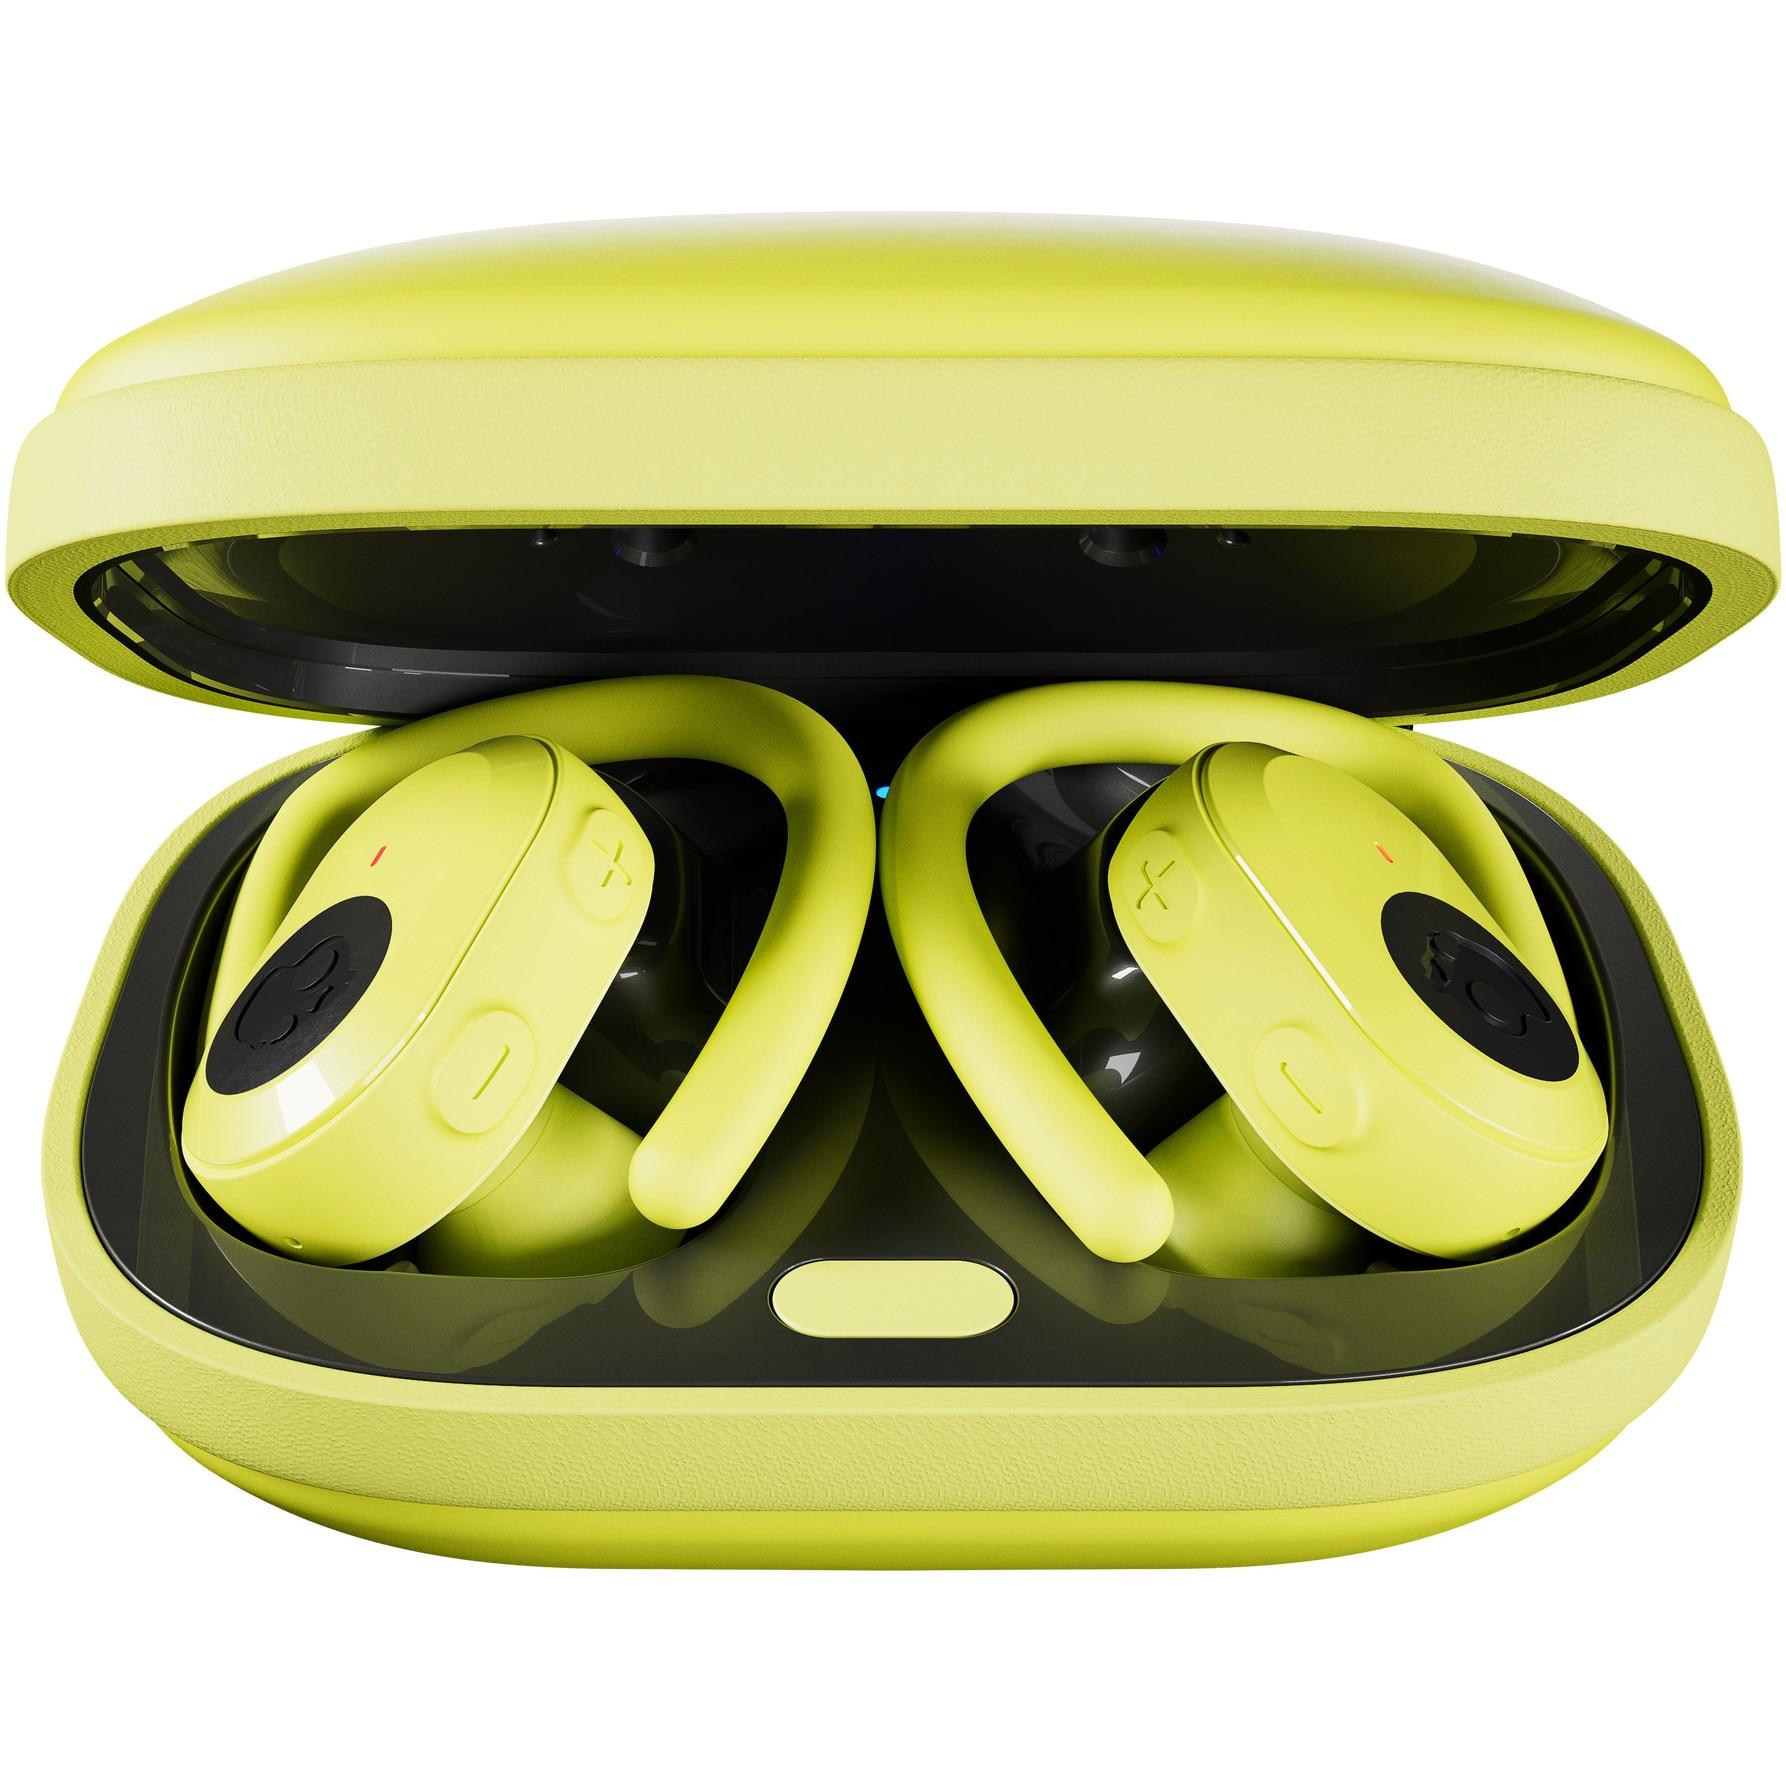 Fotografie Casti Audio Sport In Ear Skullcandy Push Ultra, True Wireless, Bluetooth, Noise cancelling, Microfon, Autonomie 6 ore, Electric Yellow